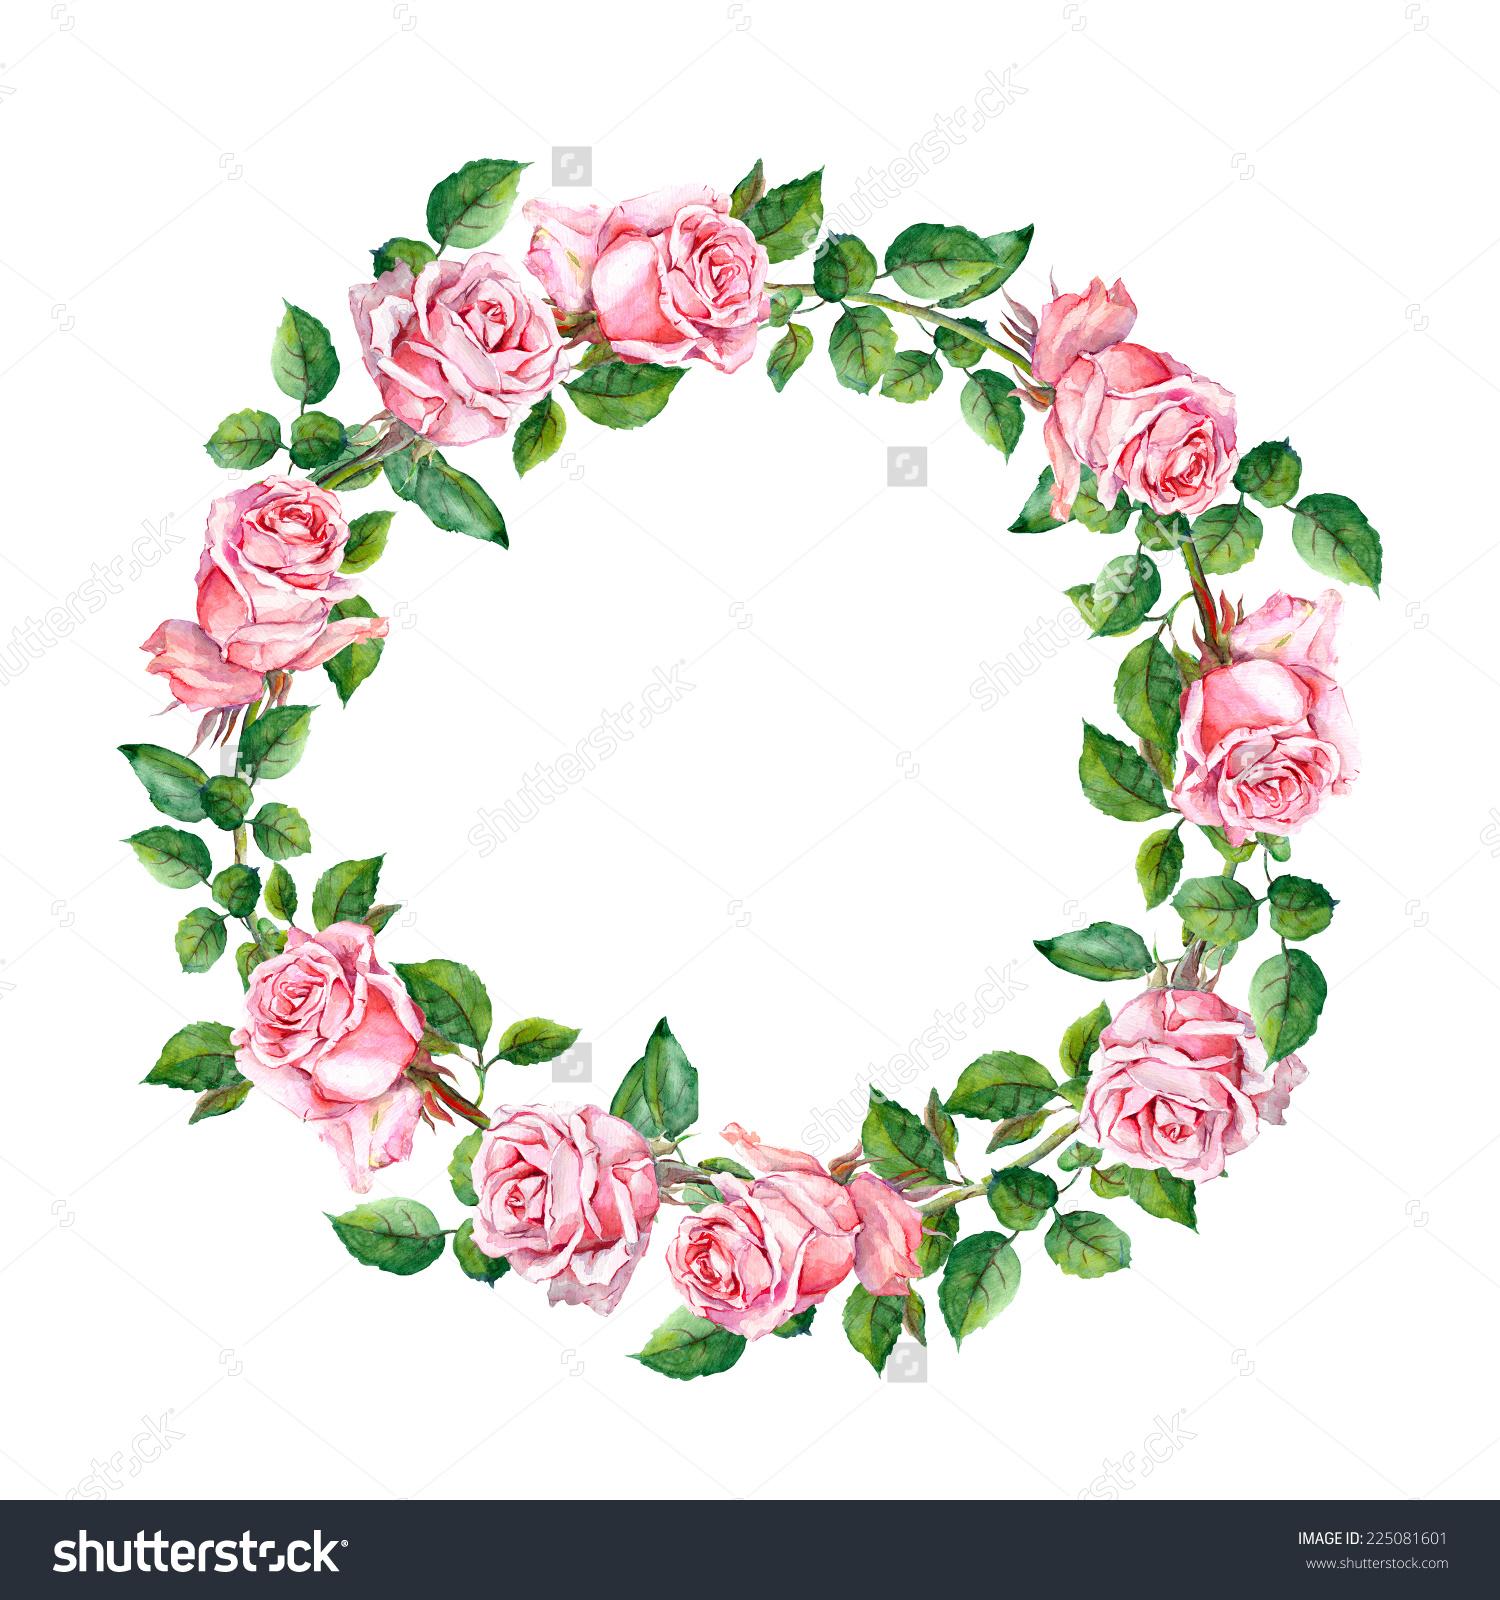 Boho clipart circle. Flower drawing at getdrawings